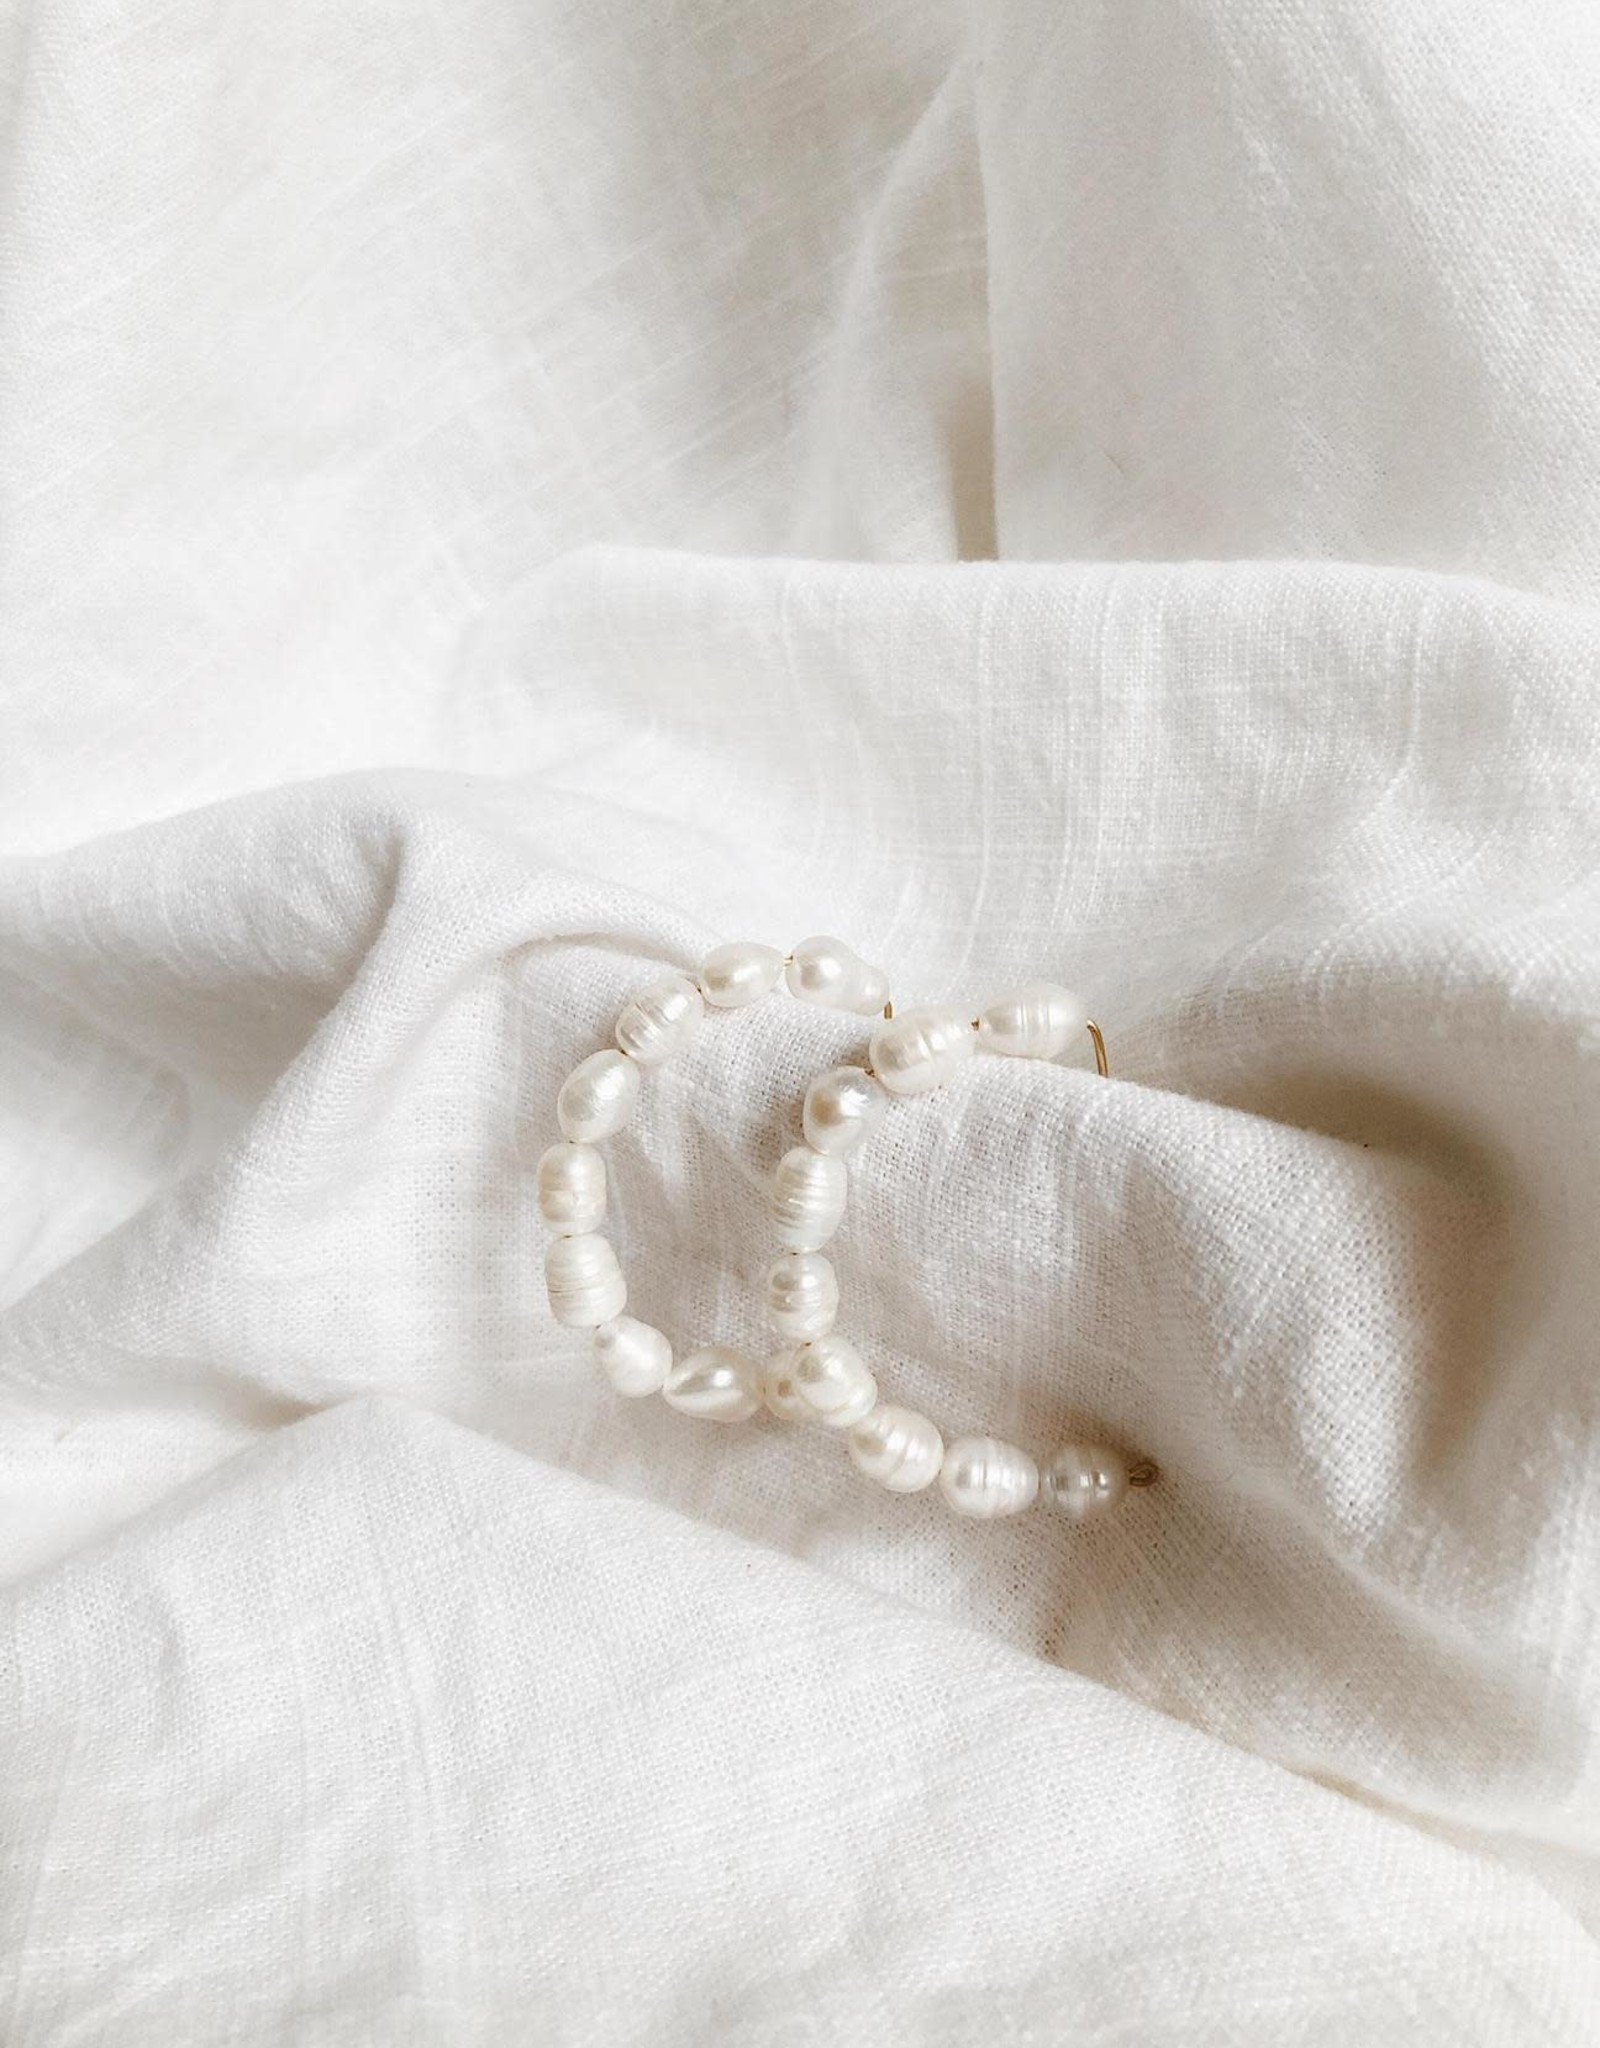 Bofemme Bofemme Pearl Hoops Earrings